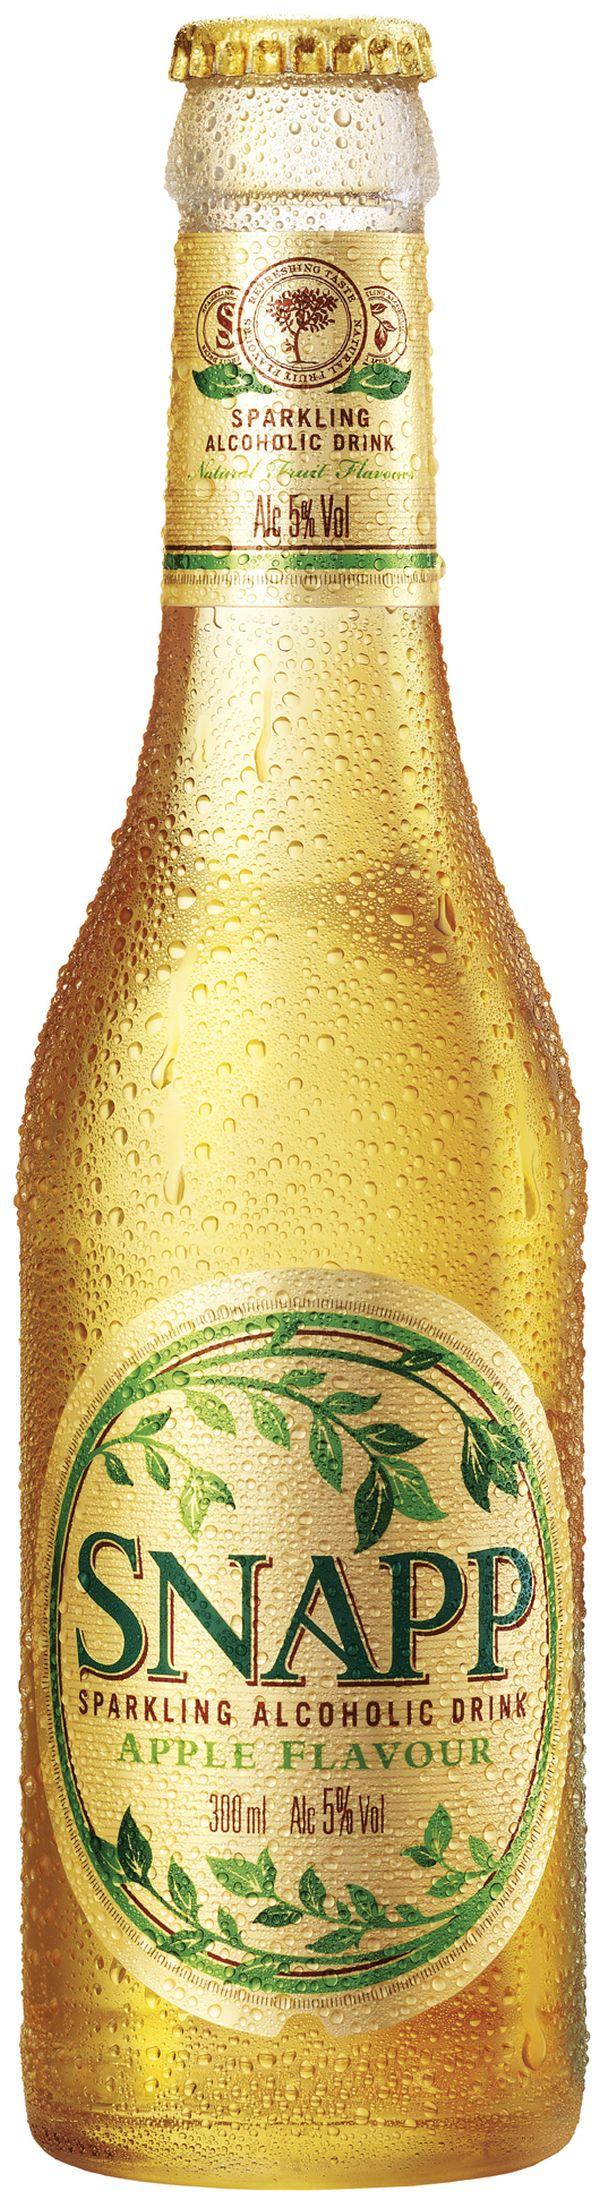 Snapp Nigeria bottle